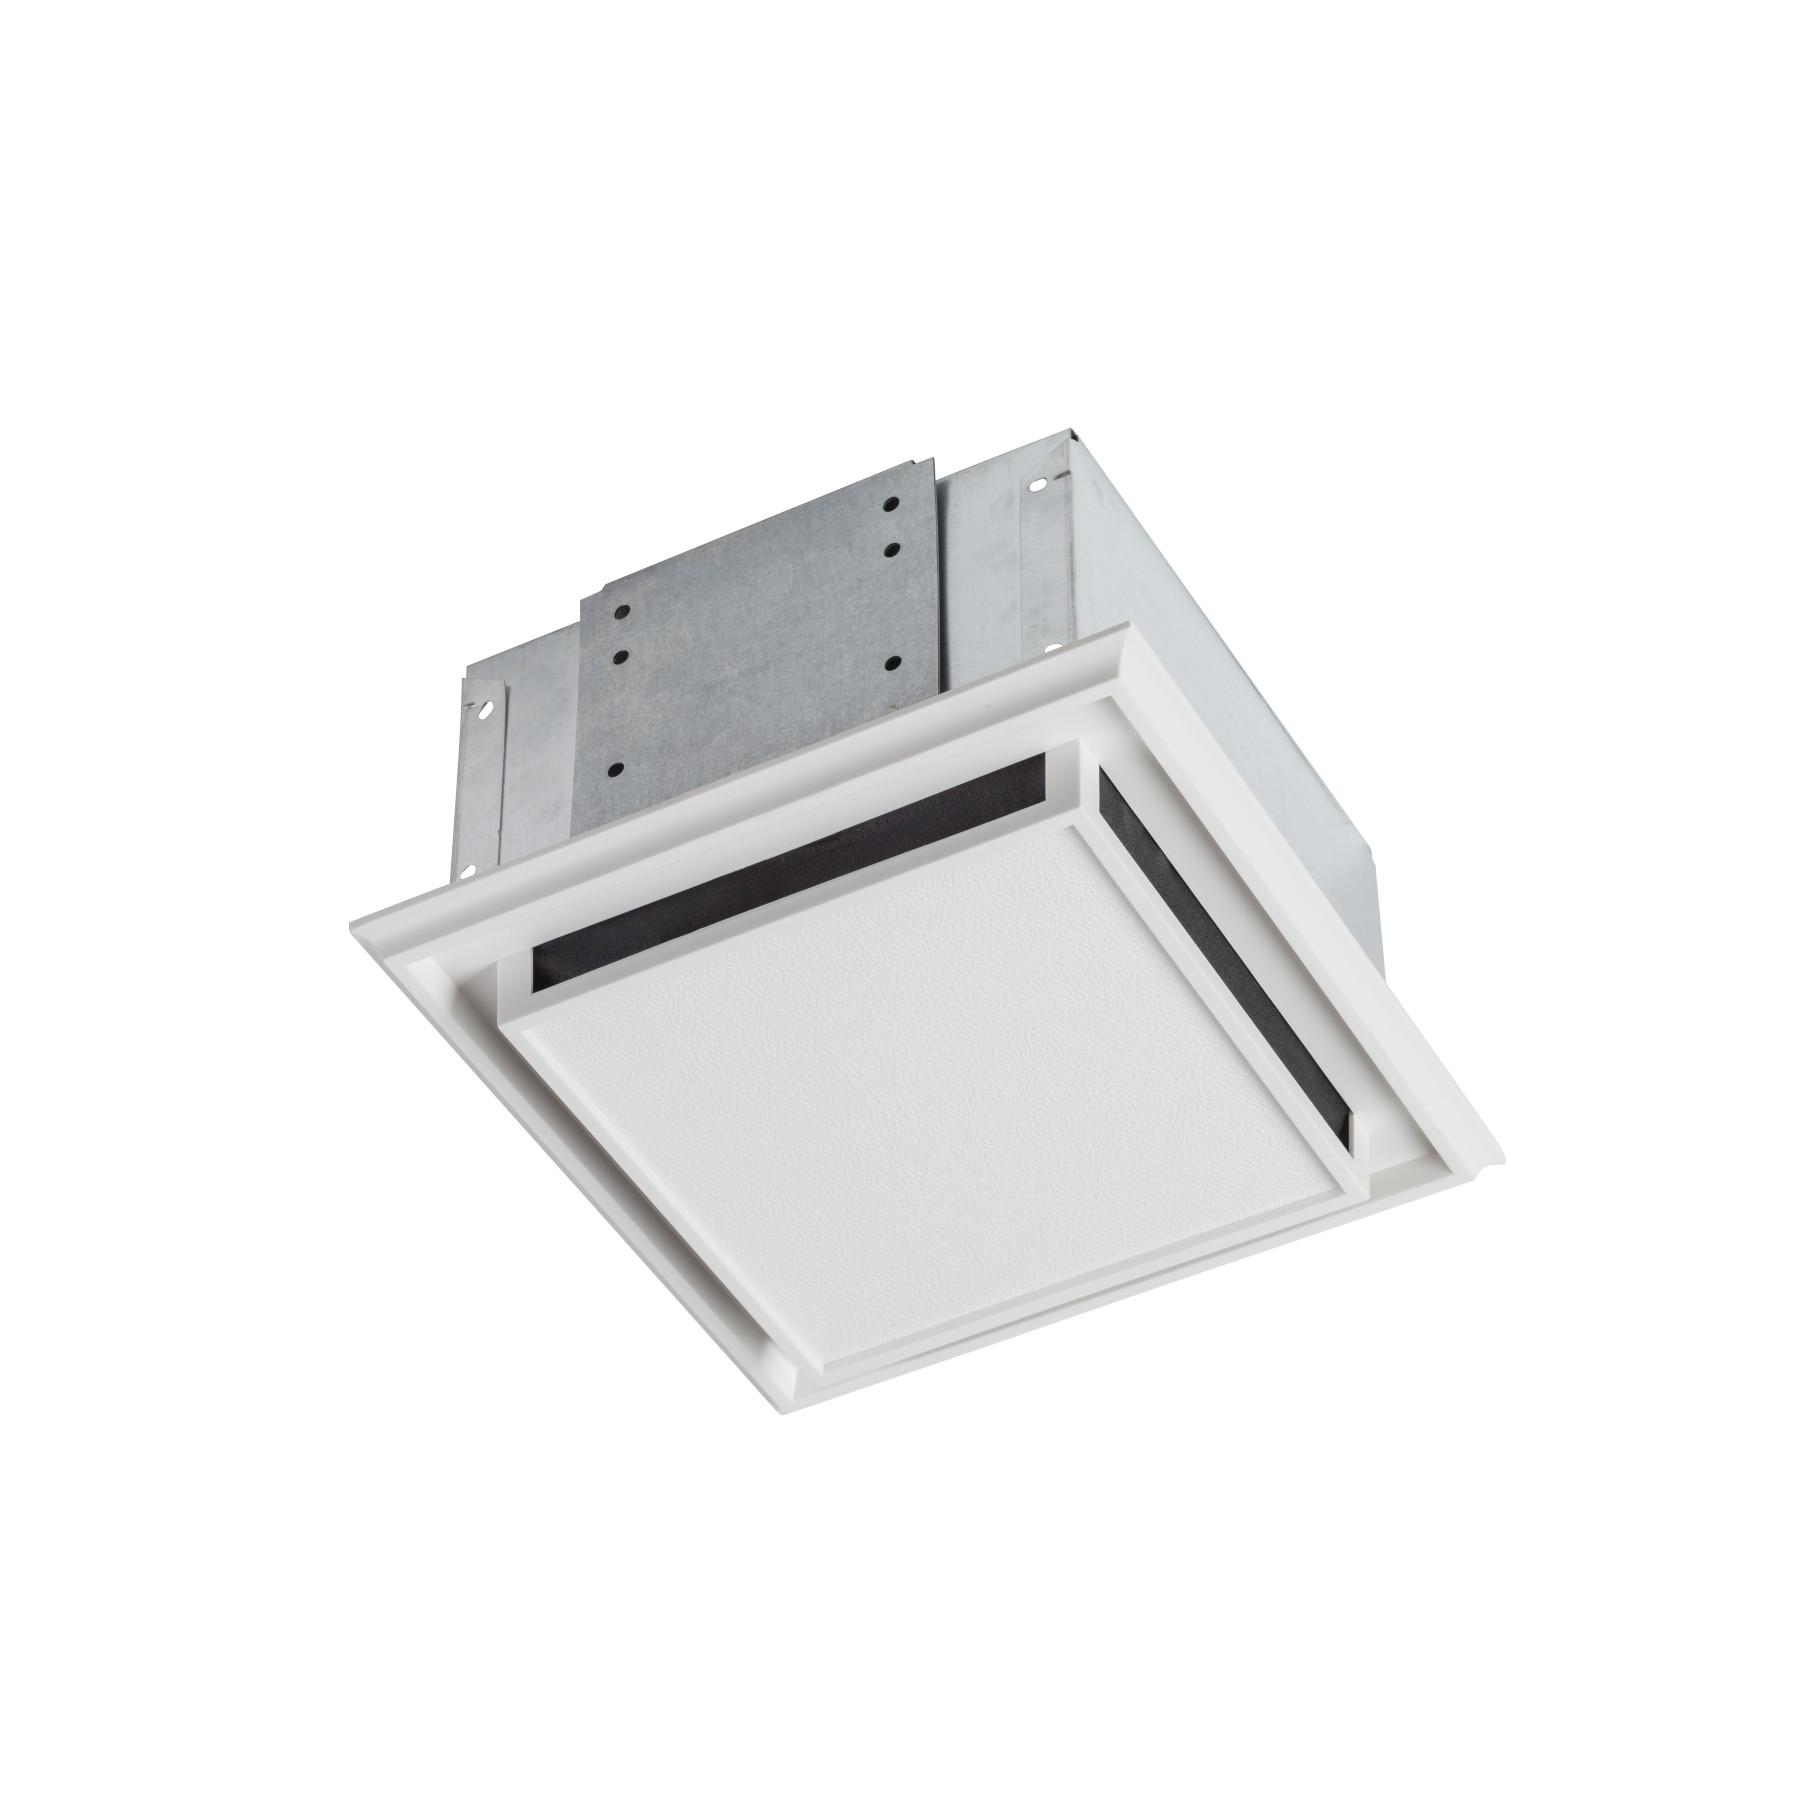 682nt nutone duct free ventilation fan